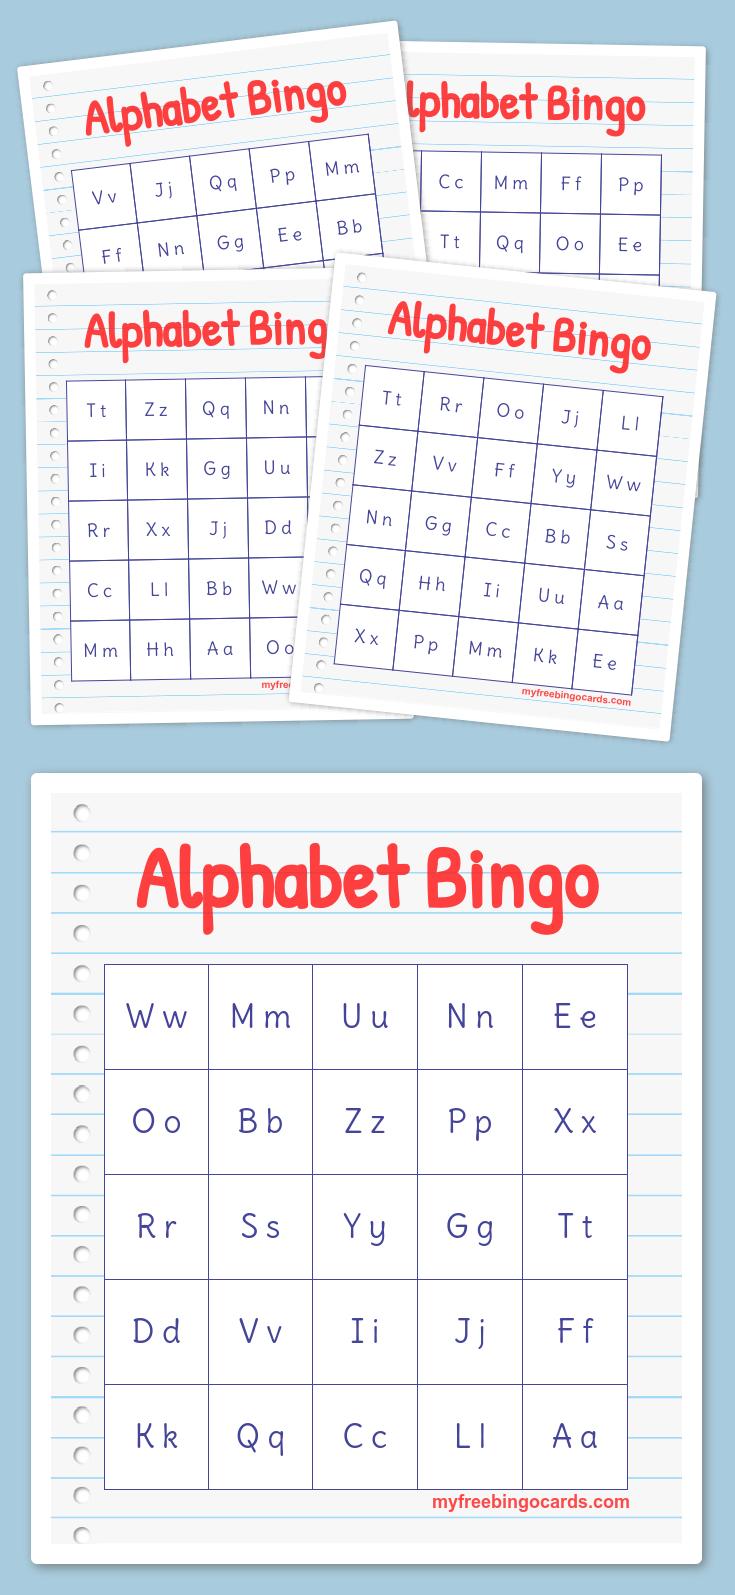 Alphabet bingo letter generator newsinvitation free printable bingo cards alphabet bingobingo card generatorfree spiritdancerdesigns Gallery